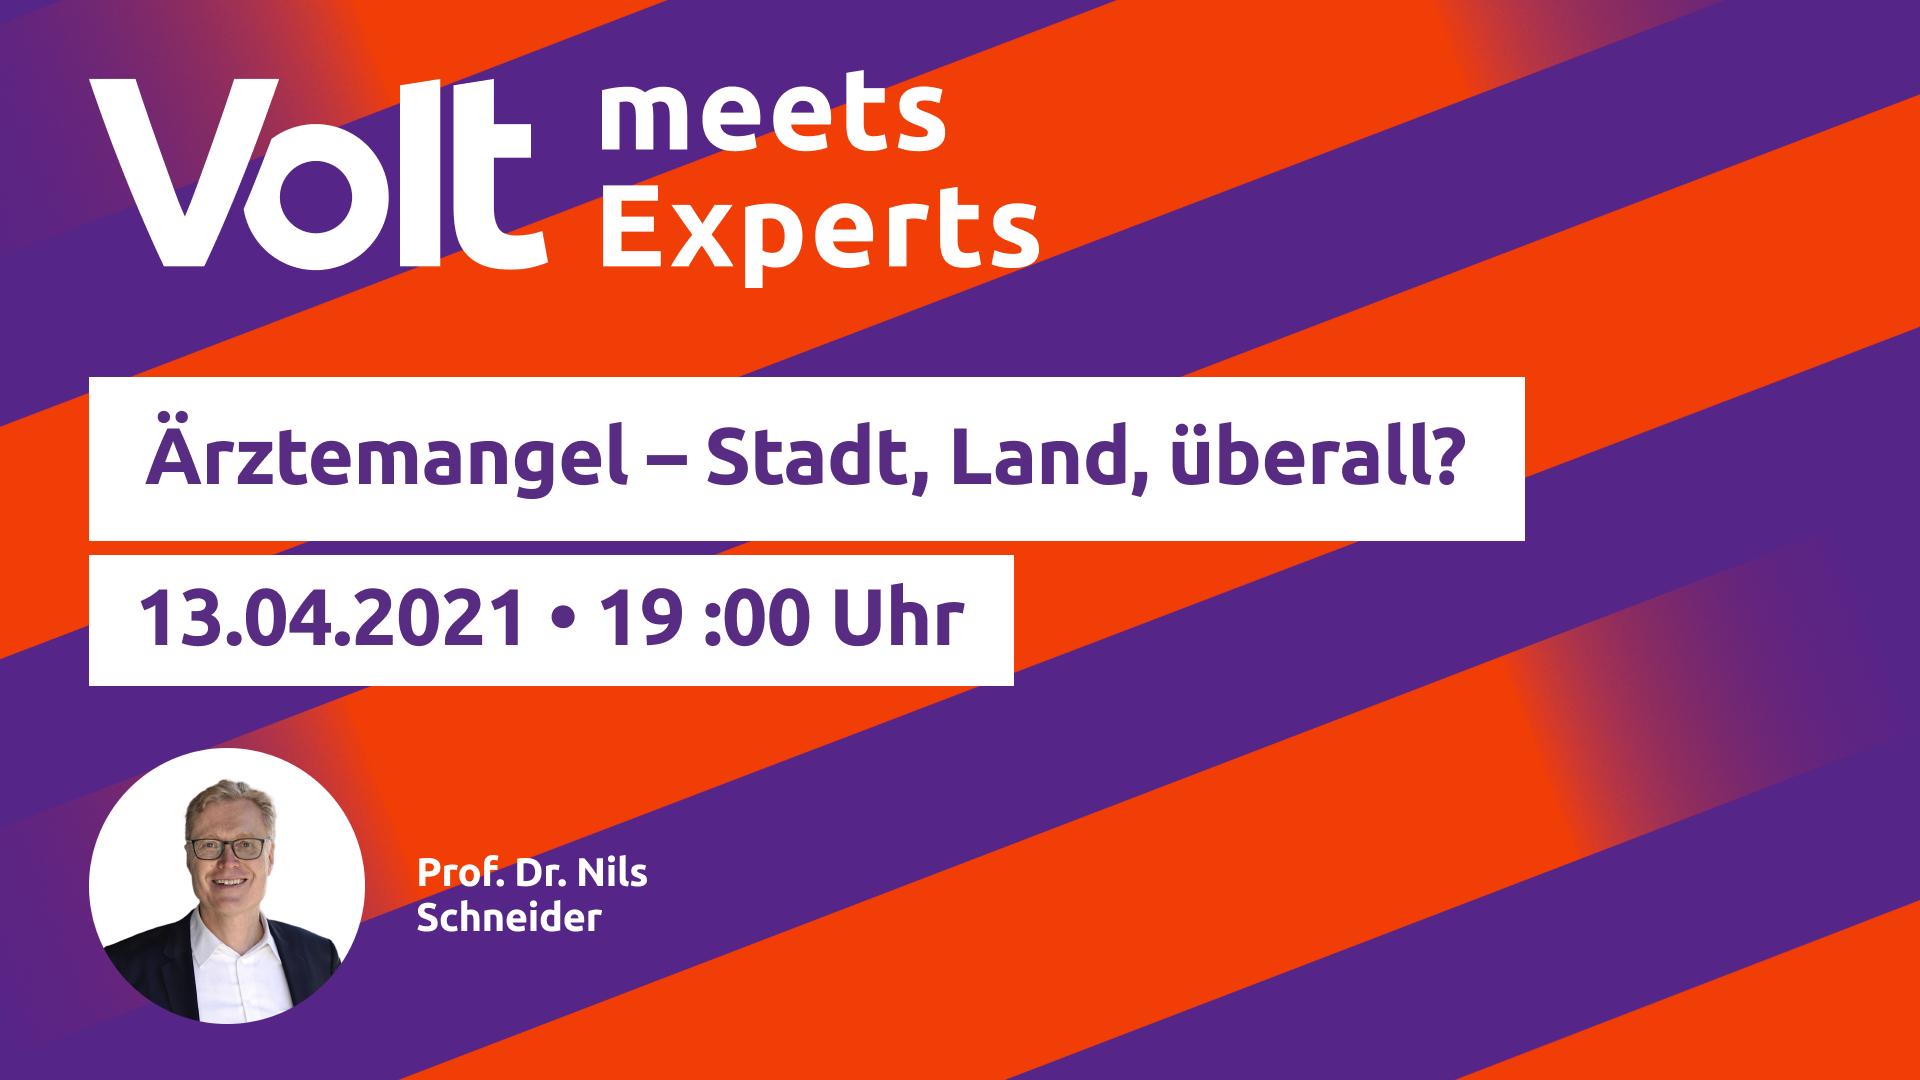 Volt meets Experts - Gesundheit - 13.04.2021